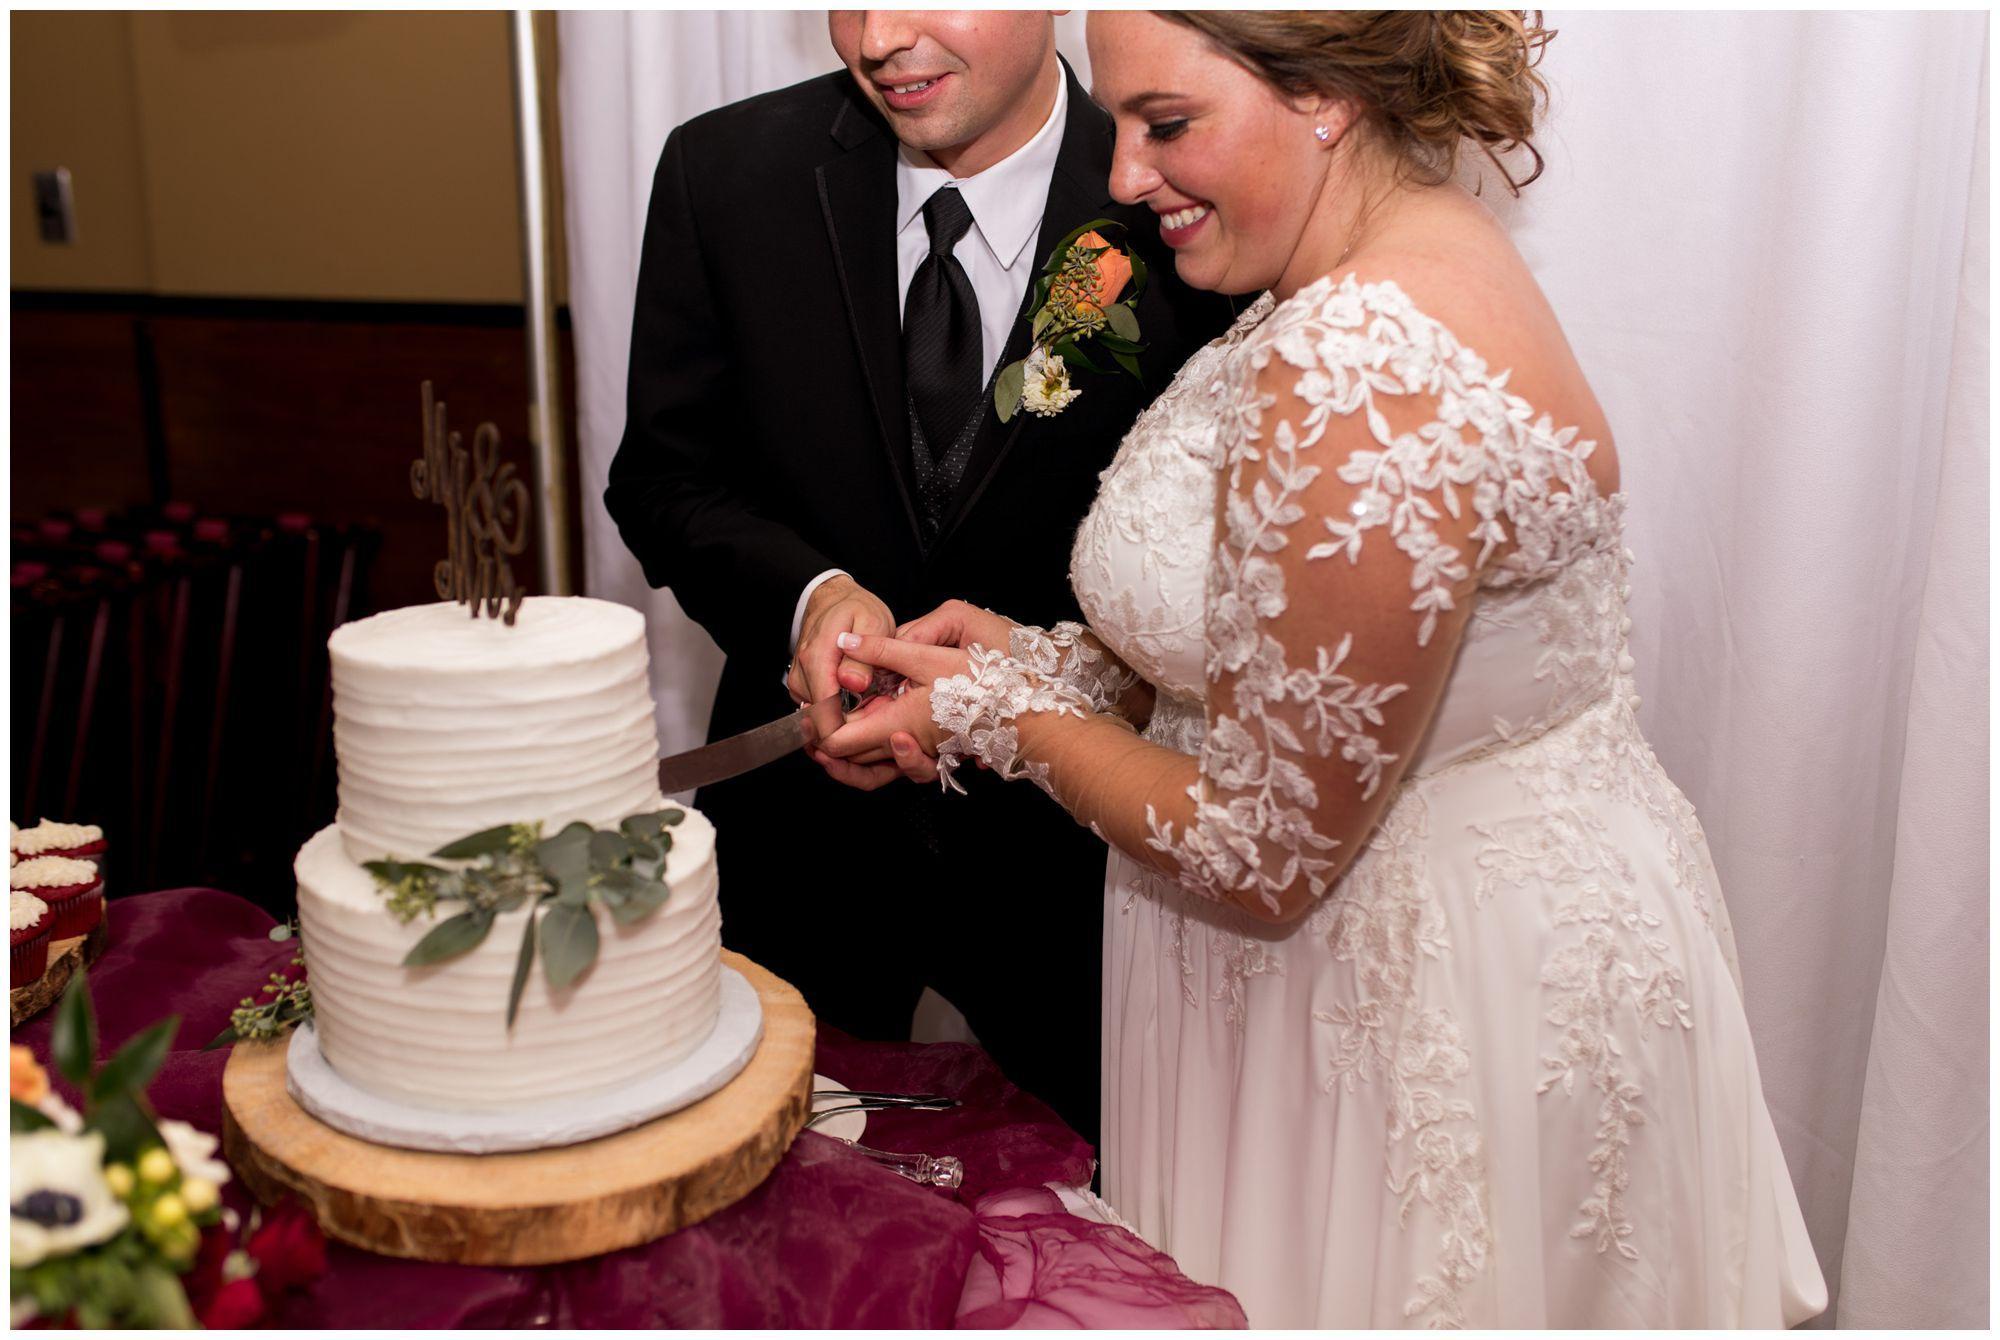 bride and groom cut wedding cake at Goeglein Homestead wedding reception in Fort Wayne